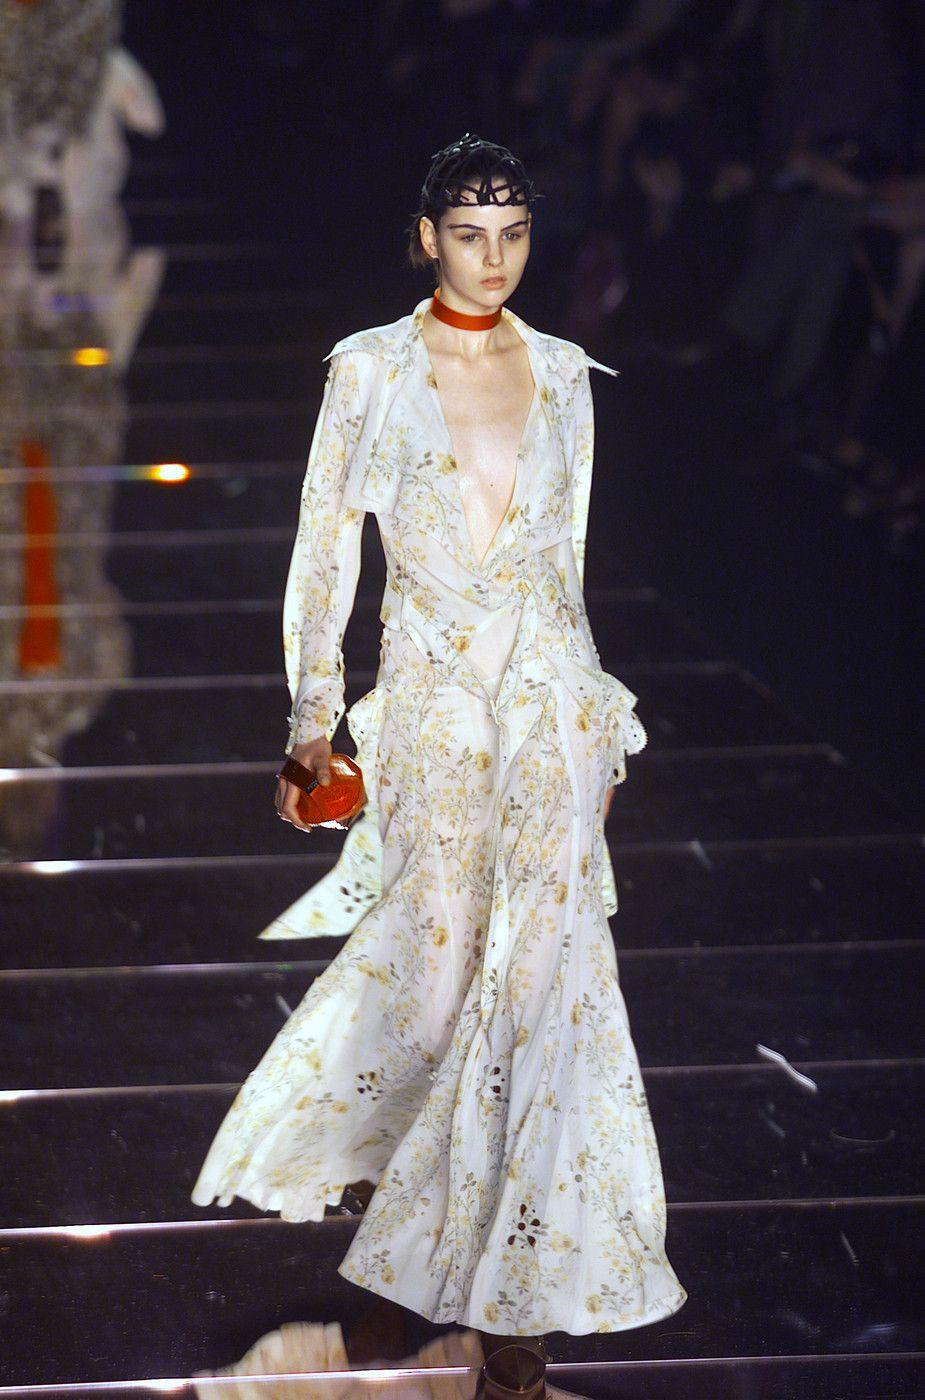 135 photos of John Galliano at Paris Fashion Week Fall 2001.